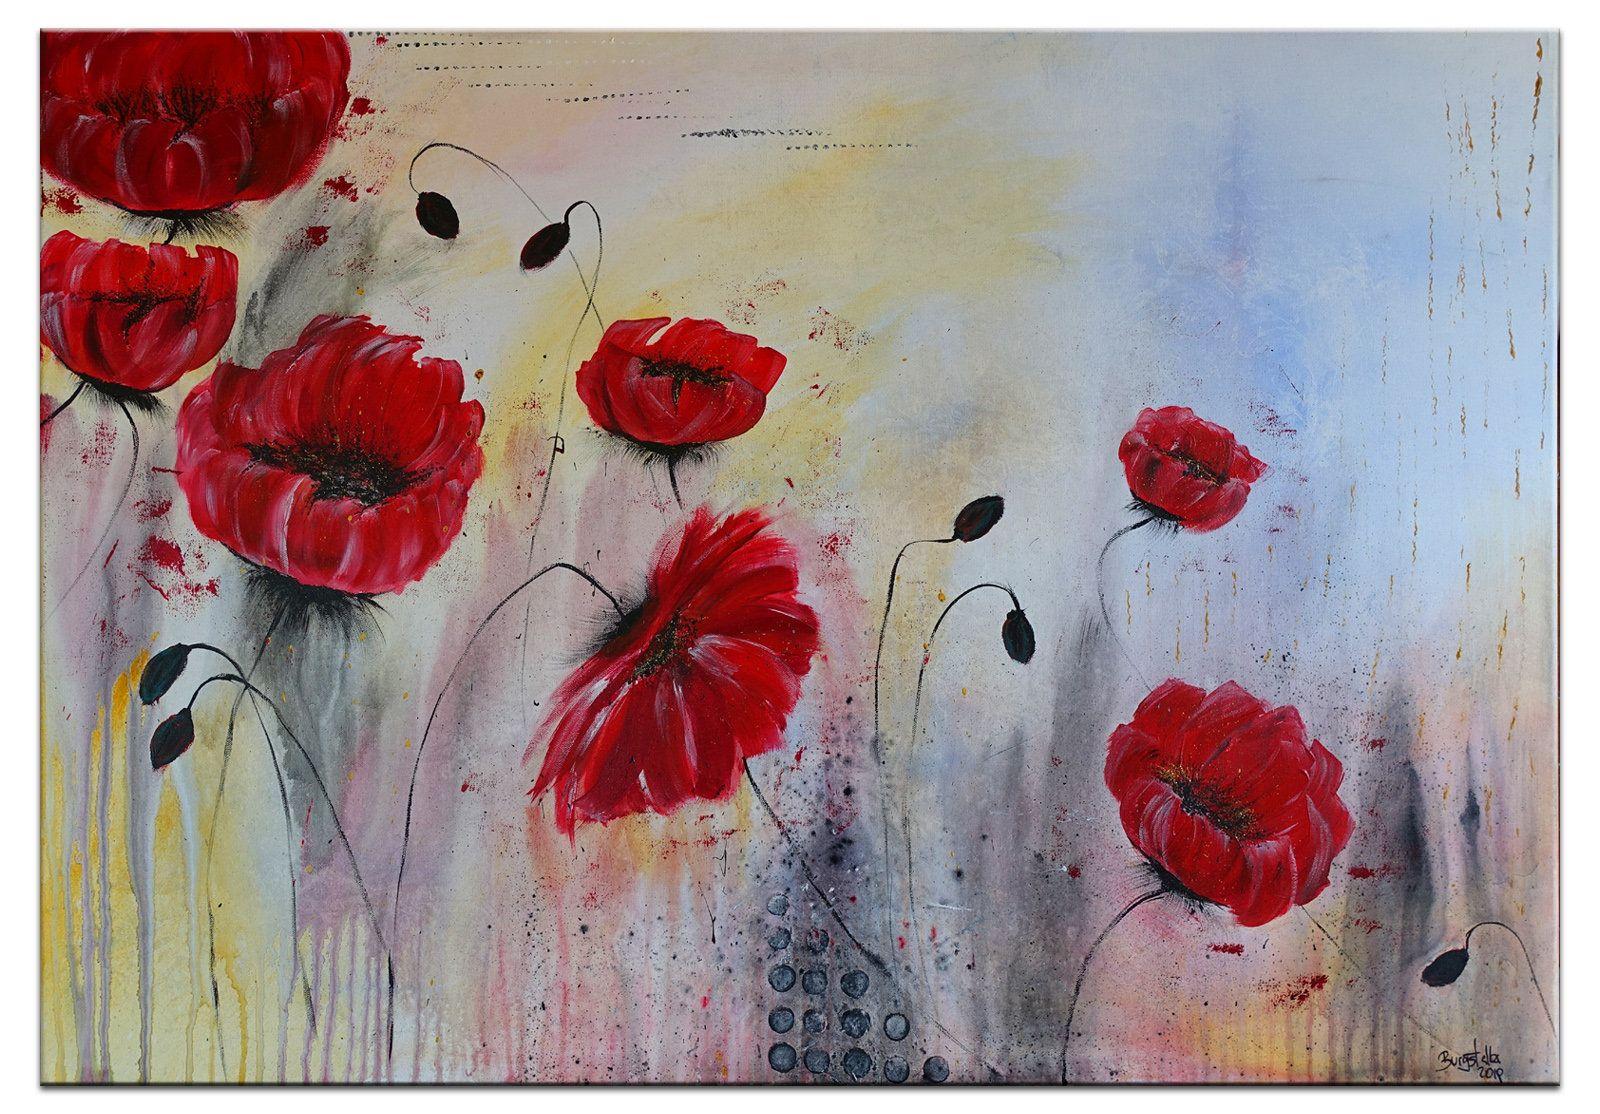 Mohnblumen Malerei Gemalde Blumenbild Original Unikat Blumen Wandbild Acrylbild Kunstbild 70x100 Poppy Painting Flower Painting Original Flower Painting